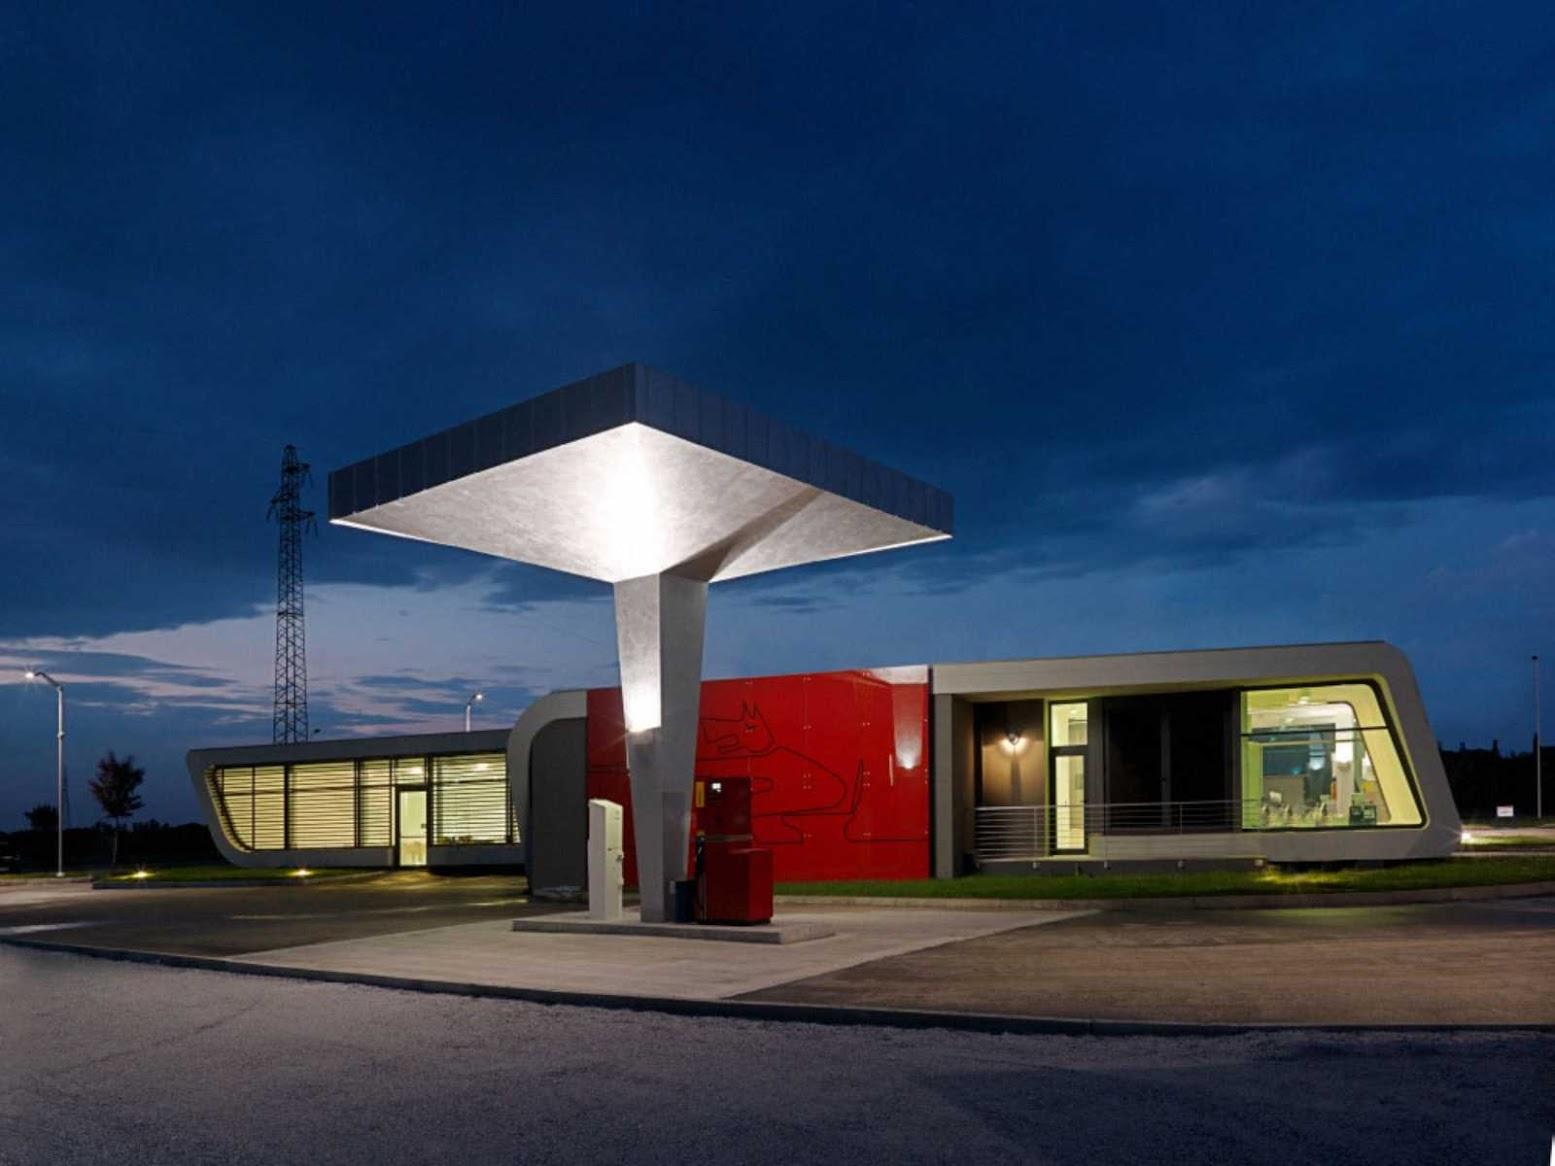 Cuneo CN, Italia: [GAZOLINE STATION BY DAMILANO STUDIO ARCHITECTS]